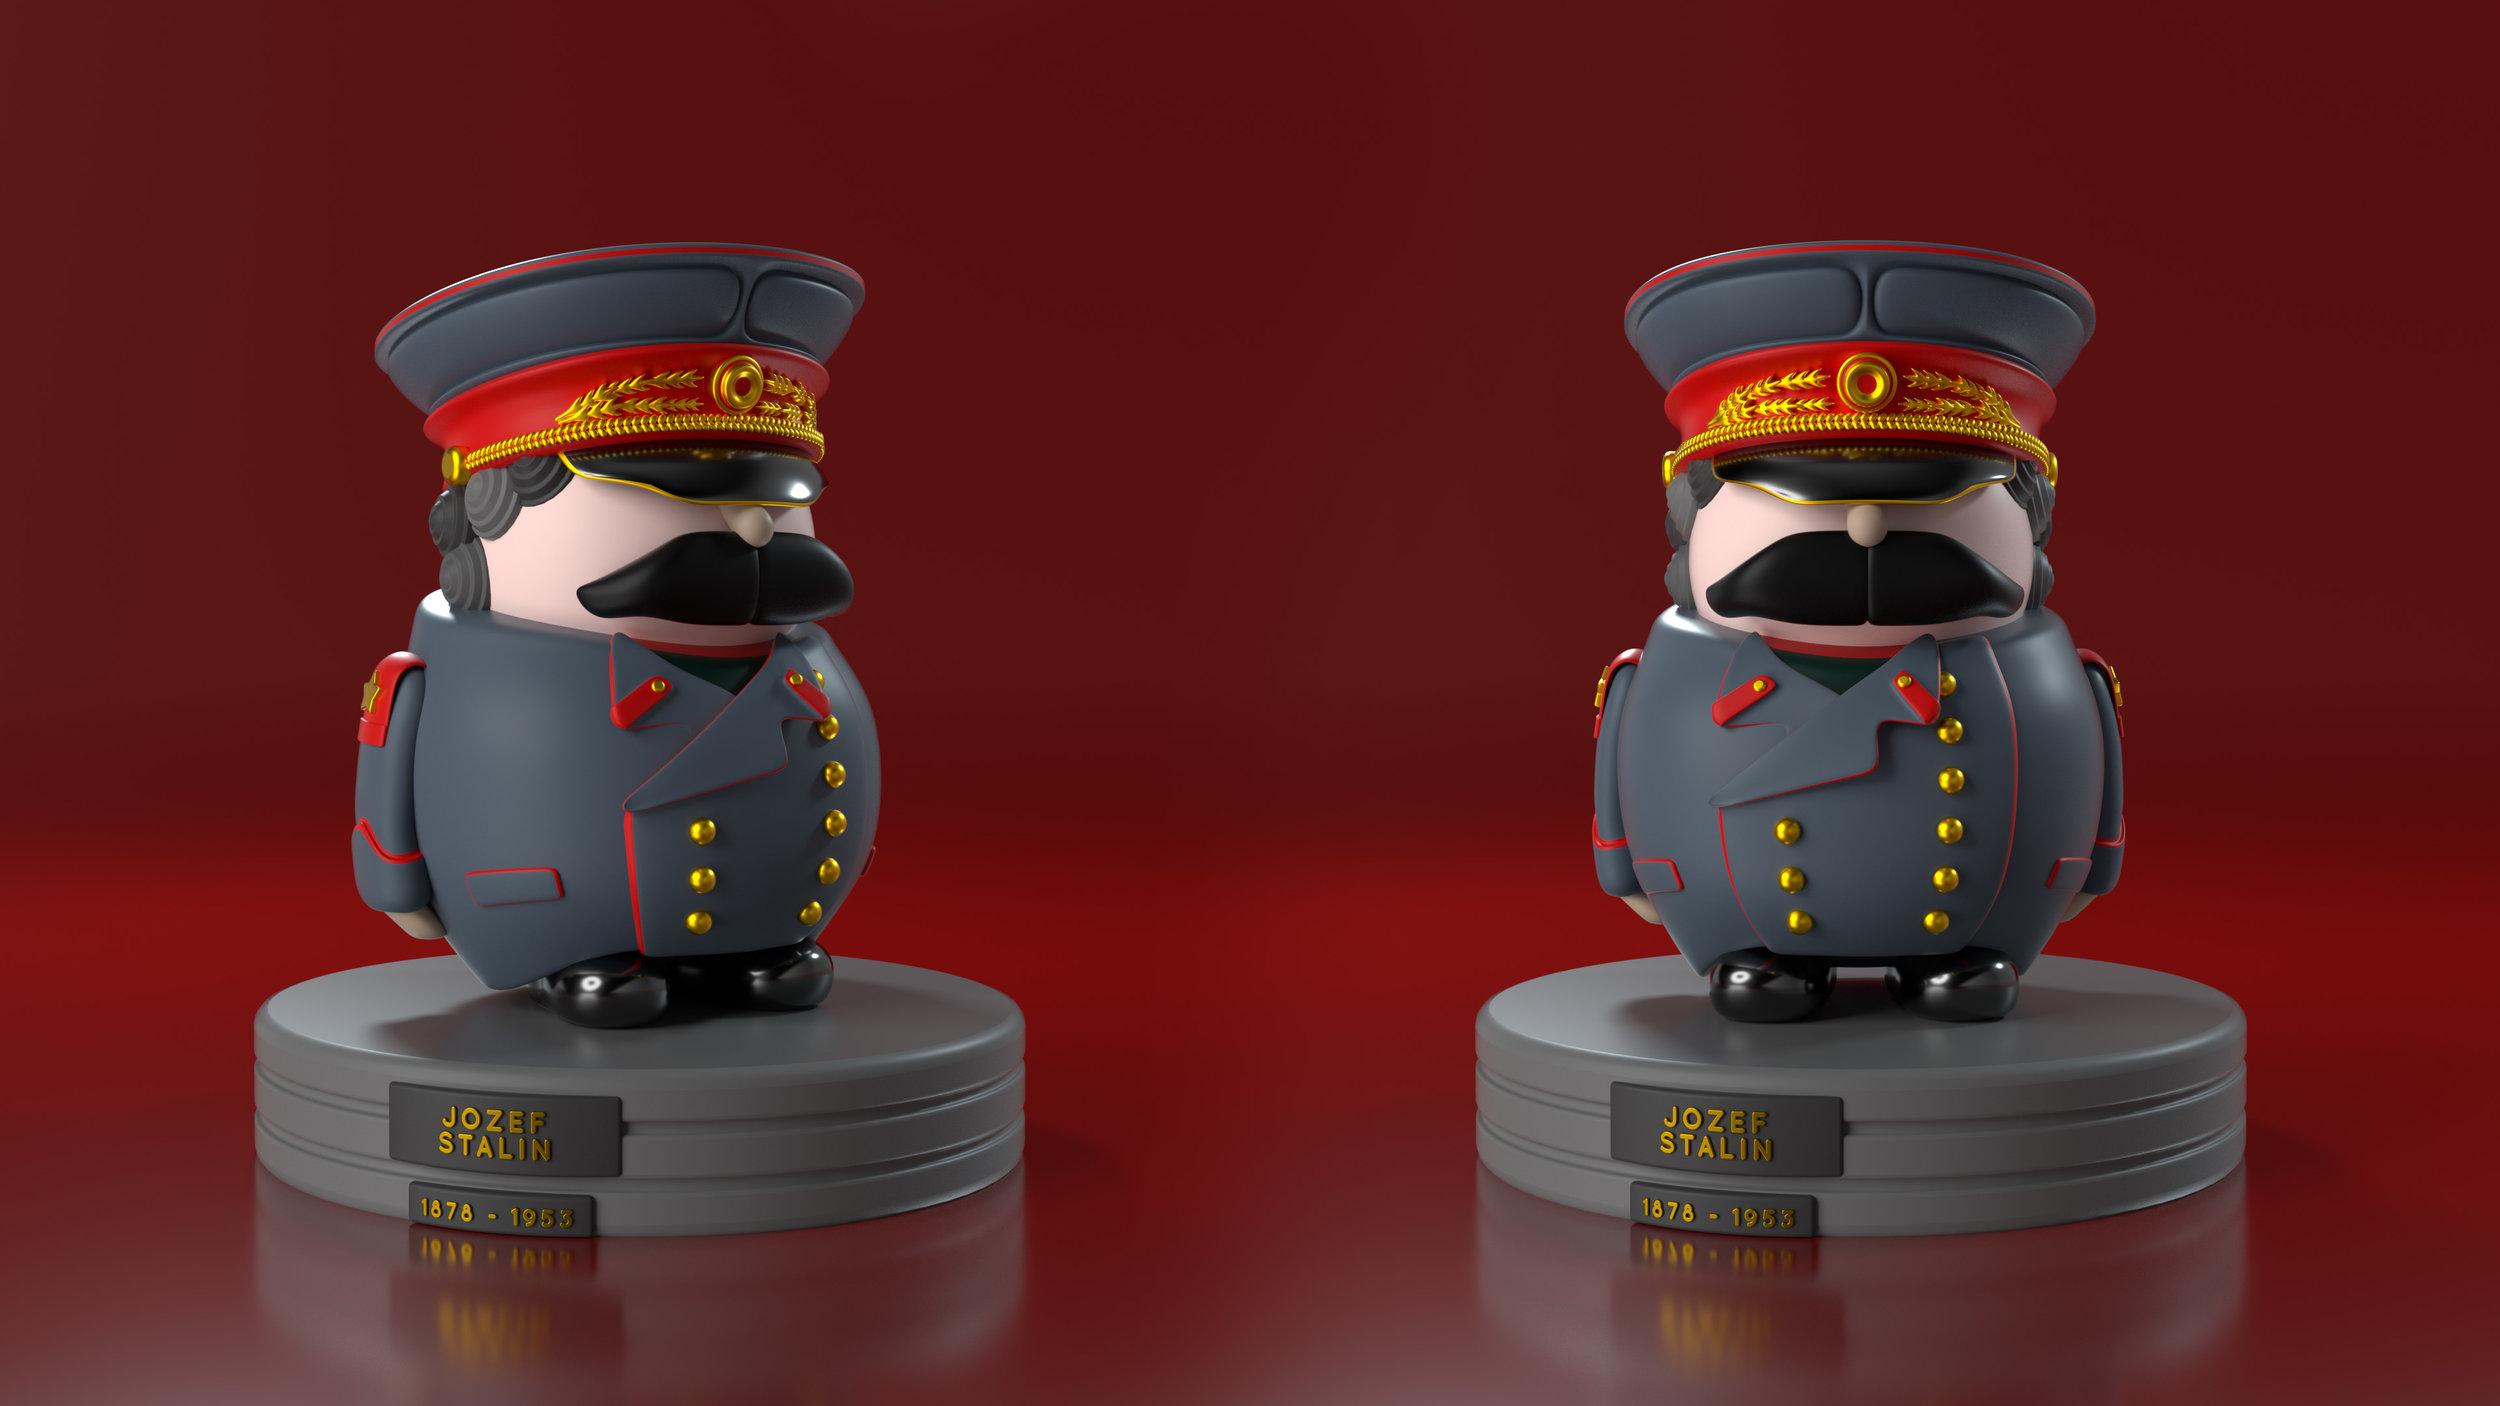 Stalin_both.jpg